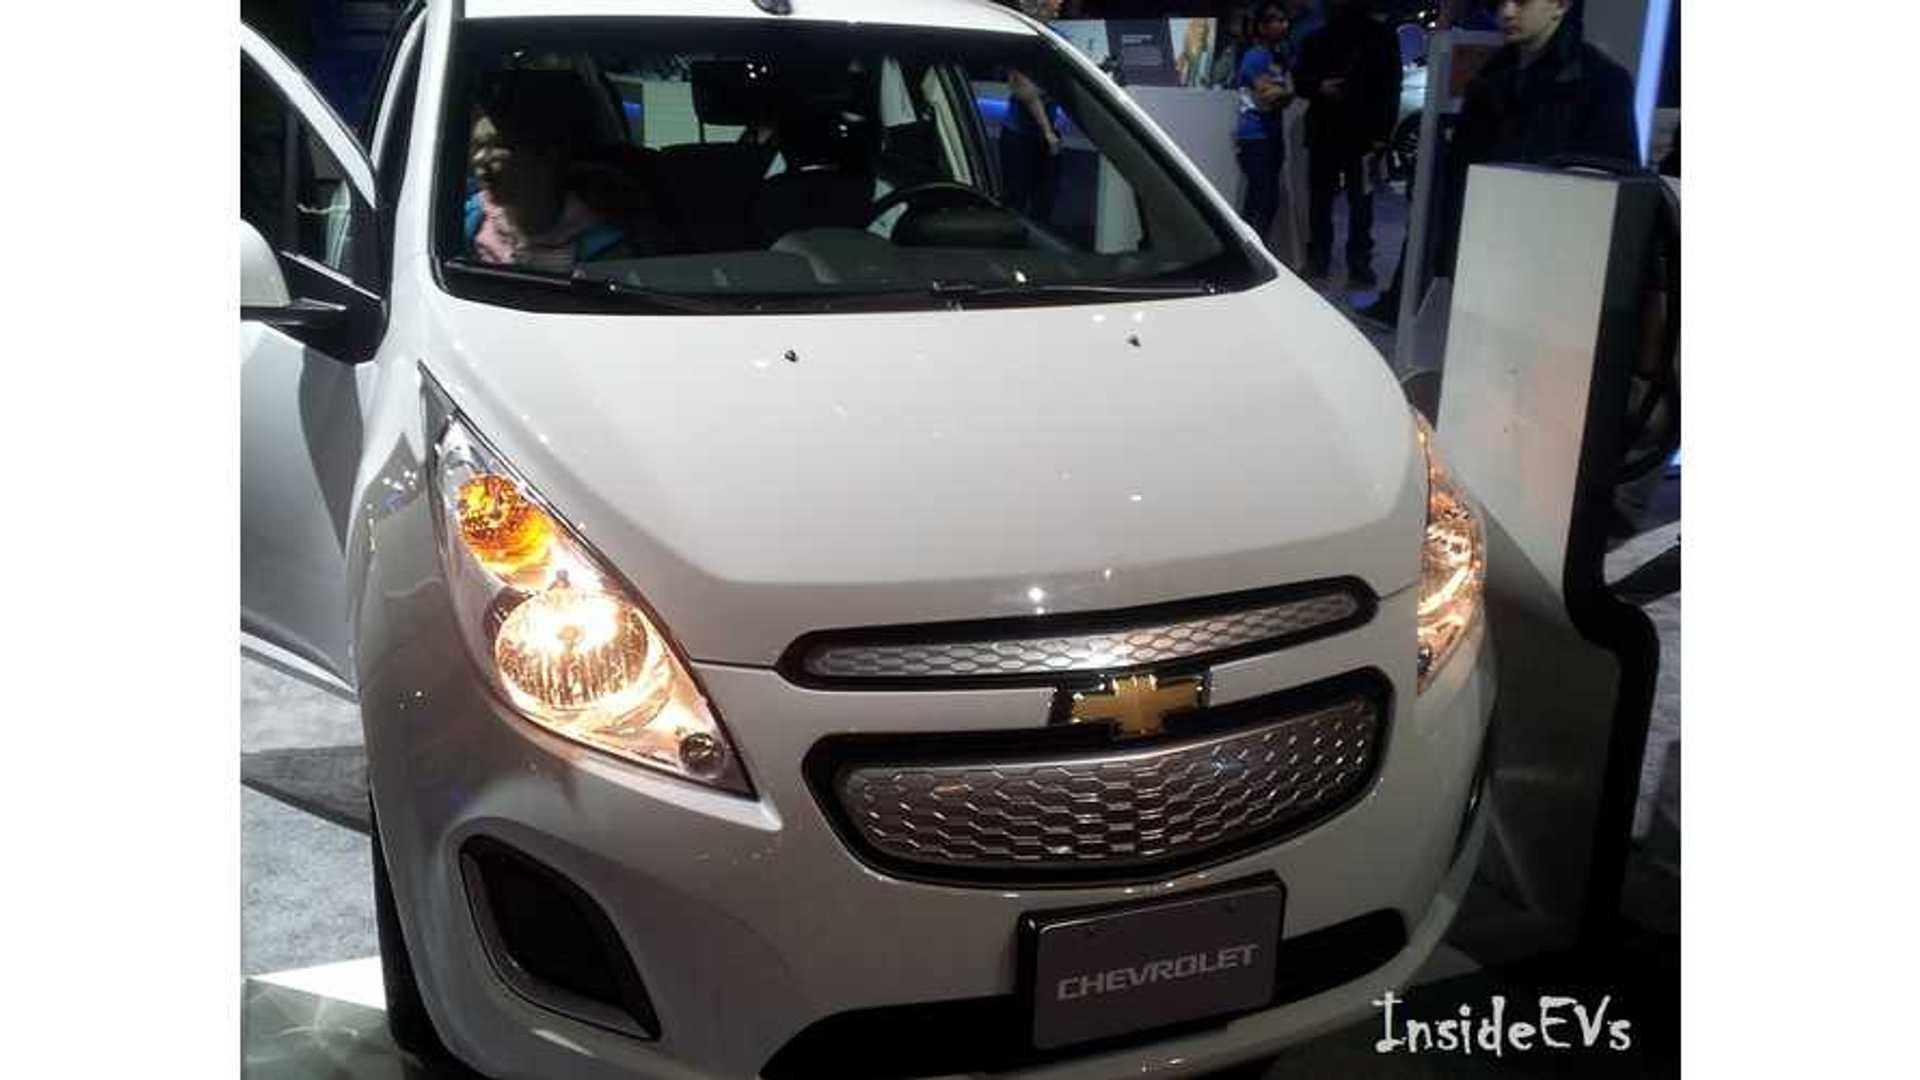 Chevrolet Spark Ev Recalled For Airbag Issue